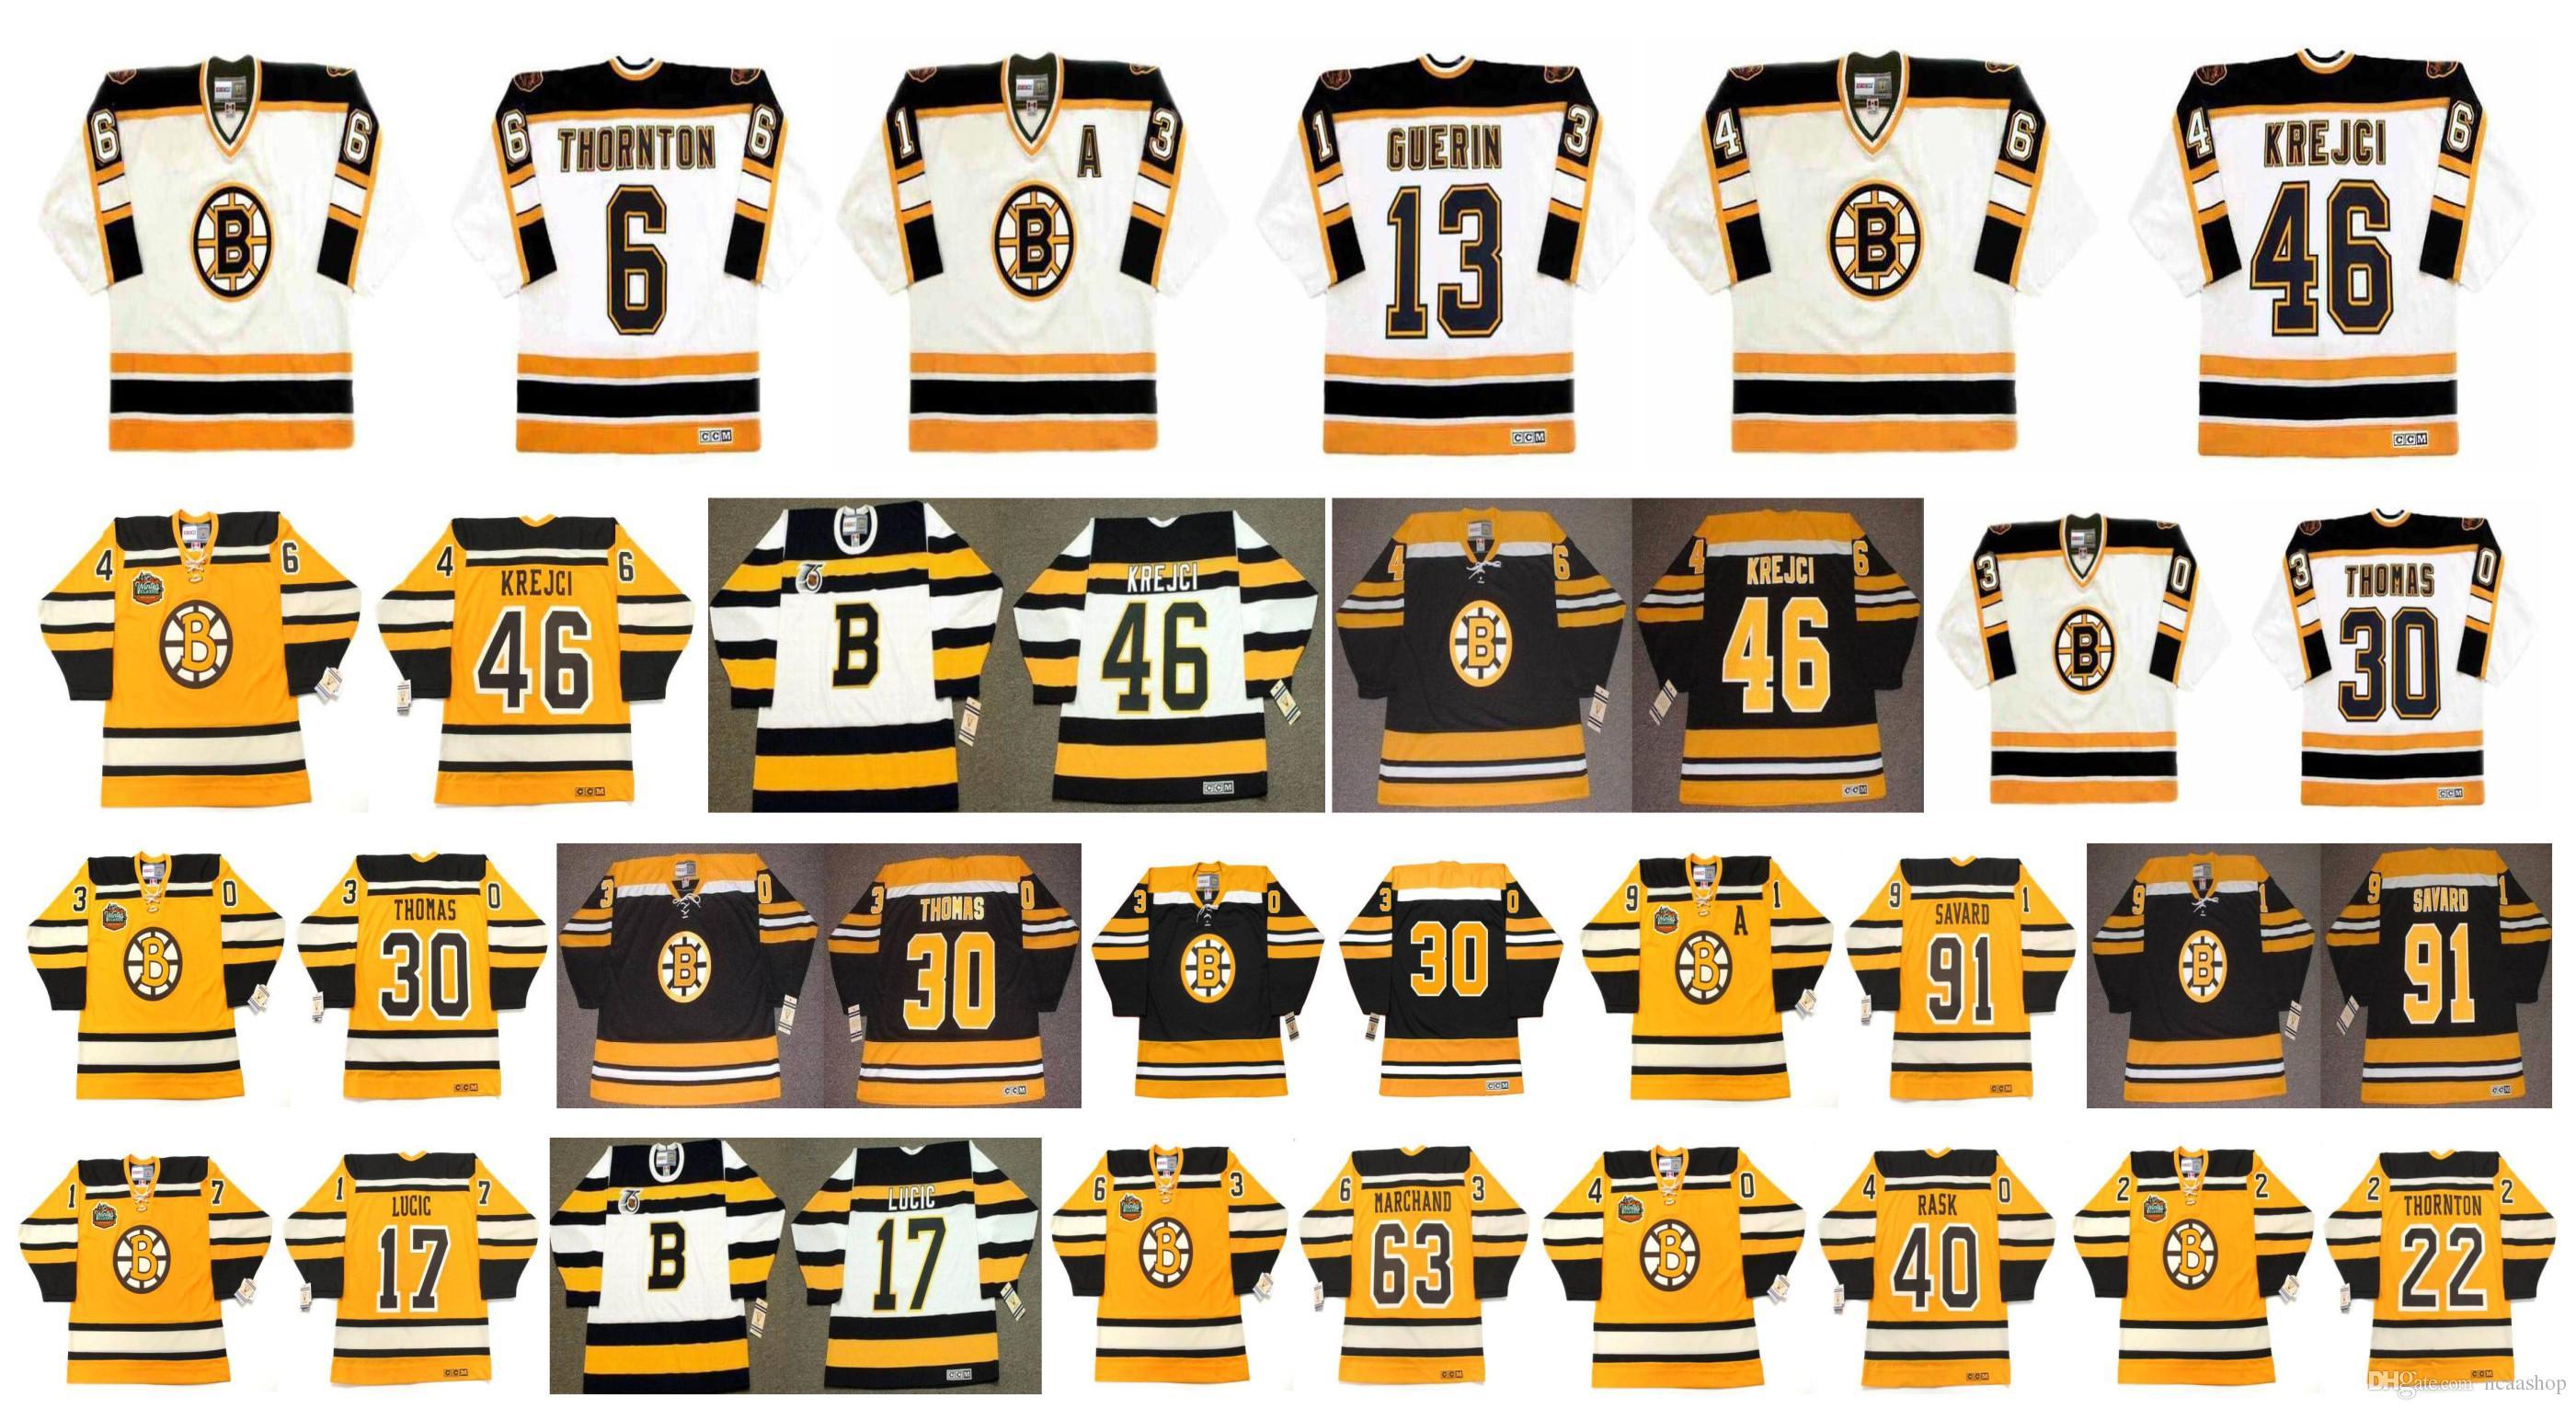 6976489eb 2019 Vintage Boston Bruins Jersey 6 JOE THORNTON 13 BILL GUERIN 46 David  Krejc 30 Tim Thomas 91 MARC SAVARD 17 Milan Lucic CCM Hockey Jerseys From  Ncaashop, ...